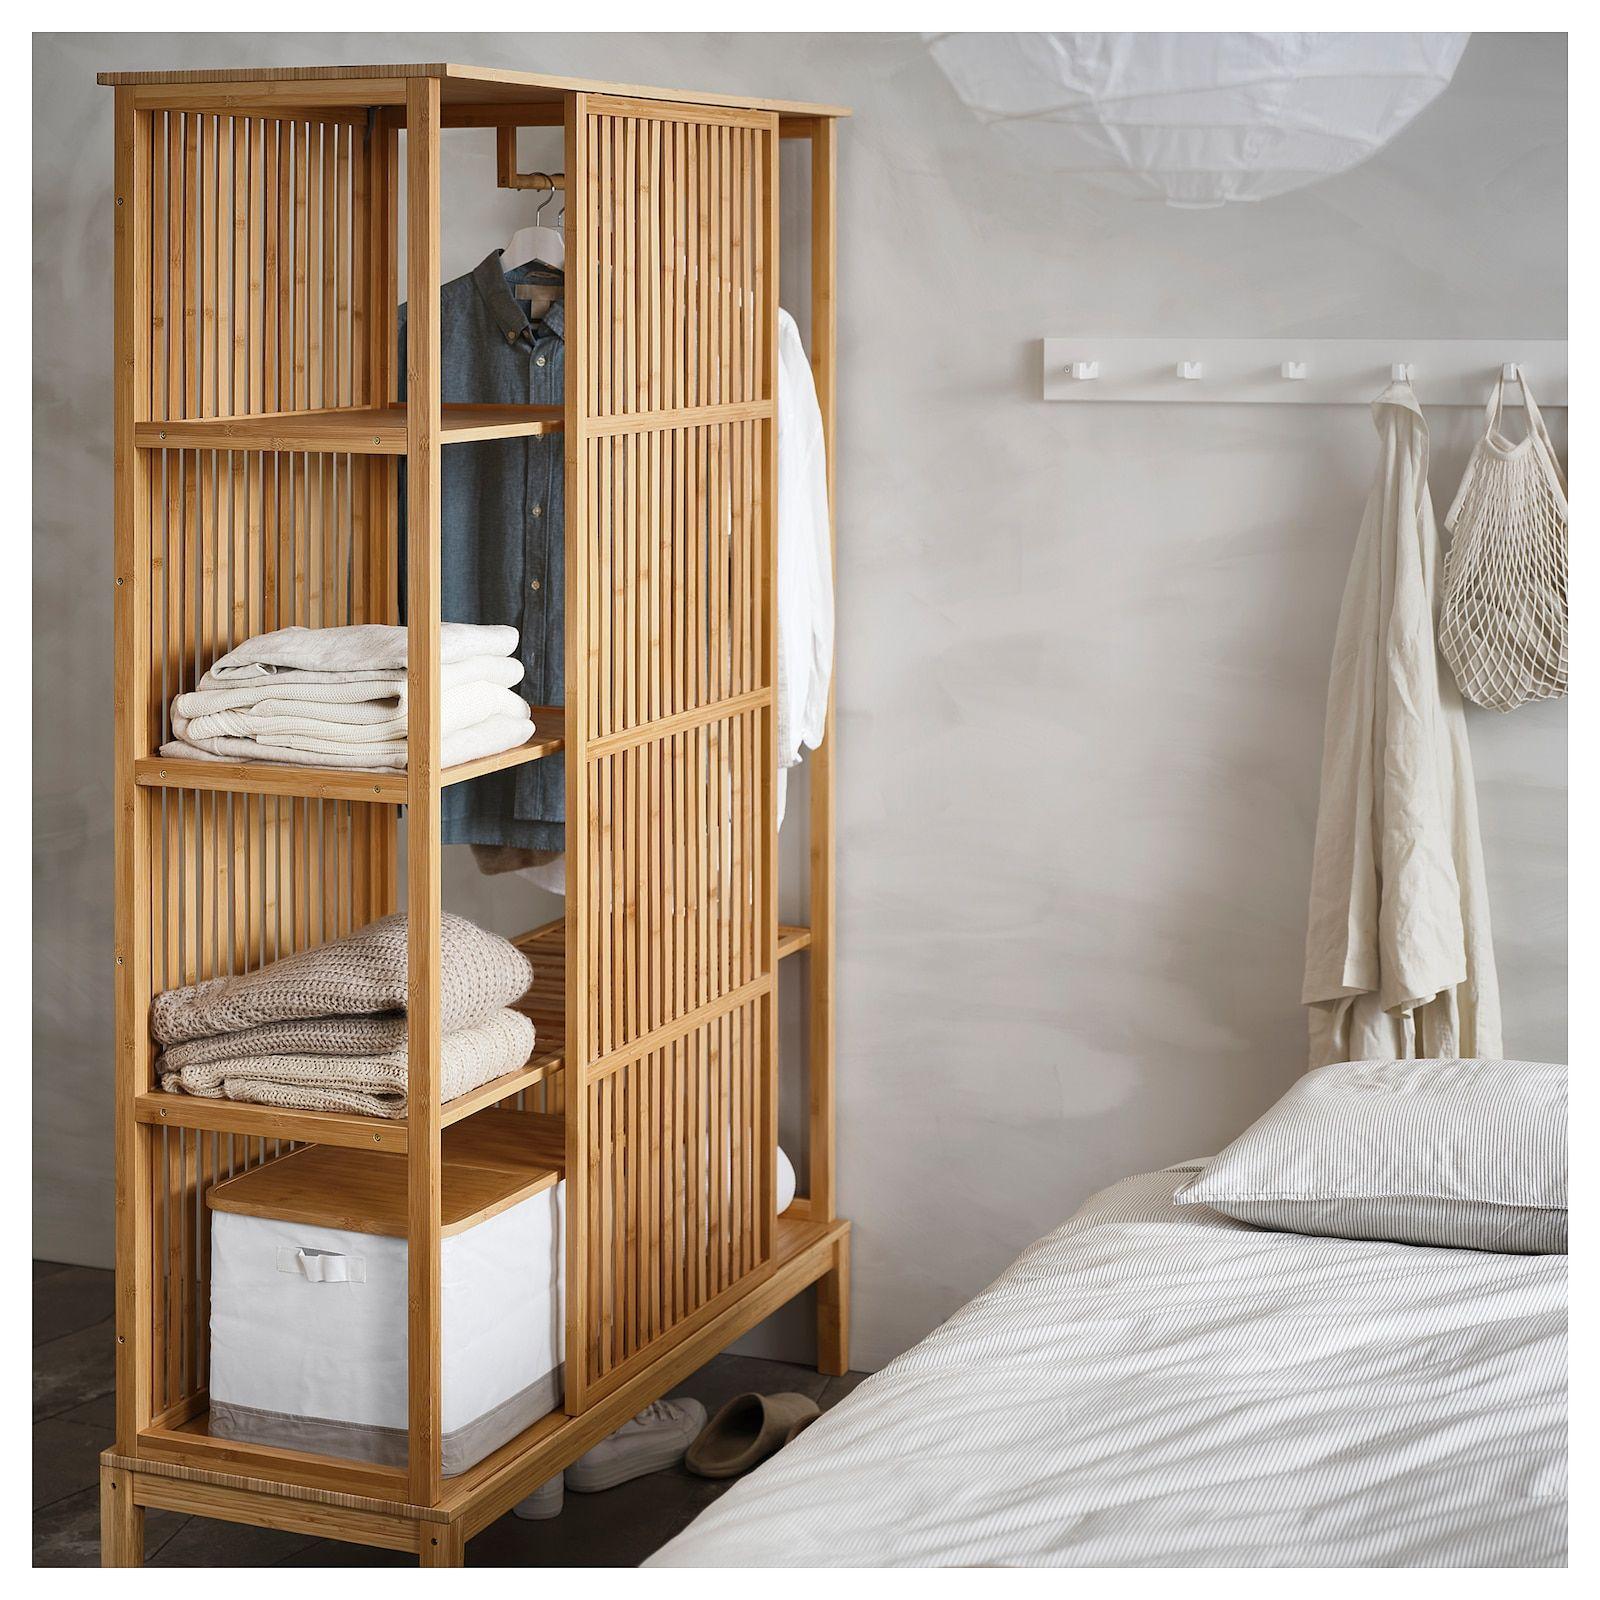 Nordkisa Open Wardrobe With Sliding Door Bamboo Width 47 1 4 Height 73 1 4 Find It Here Ikea Sliding Wardrobe Doors Open Wardrobe Bamboo Bedroom